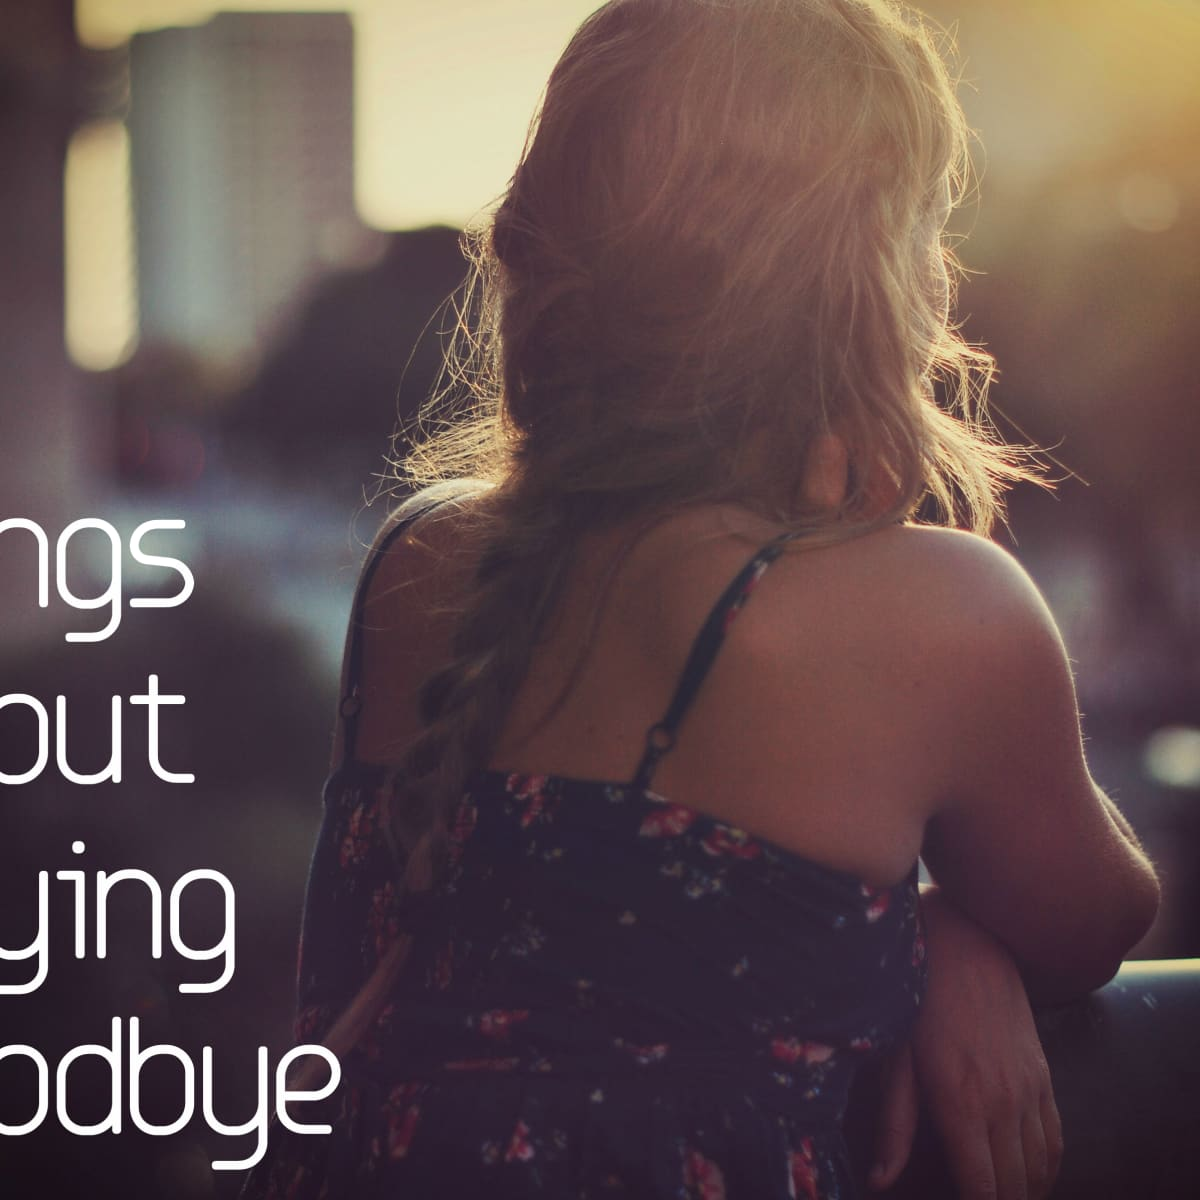 Goodbye message thank for and boyfriend you Heartfelt Goodbye